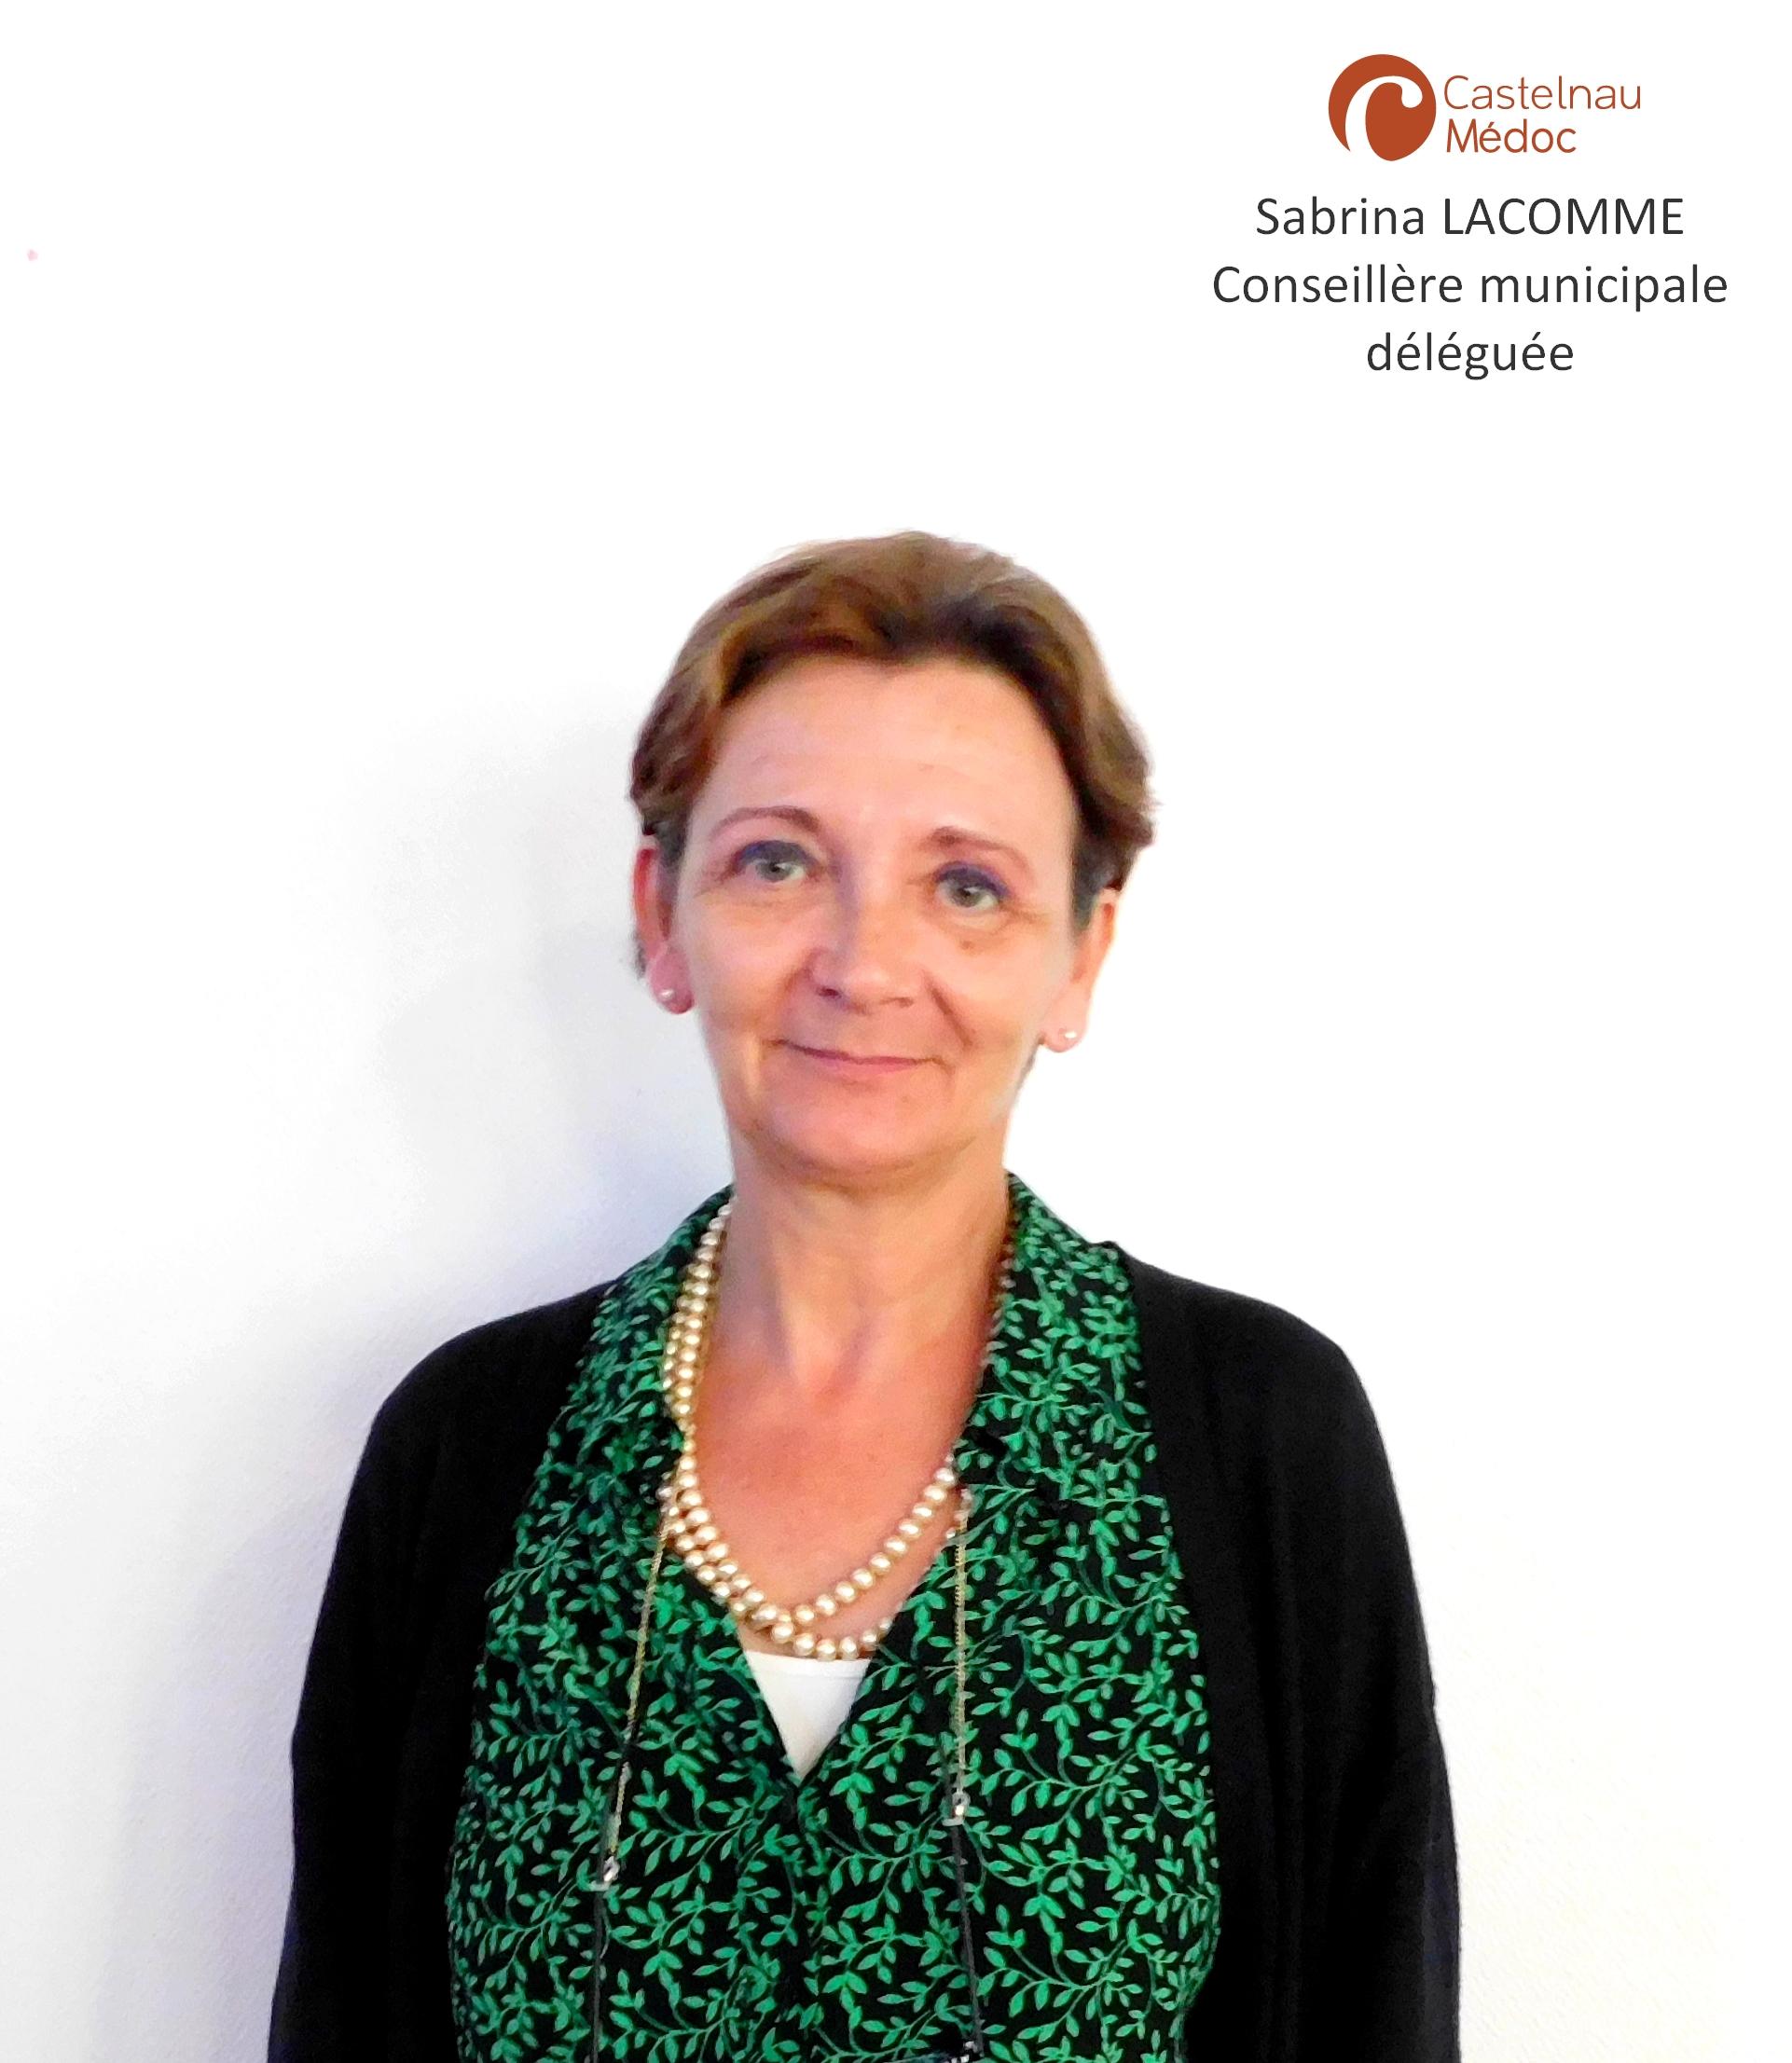 Sabrina LACOMME